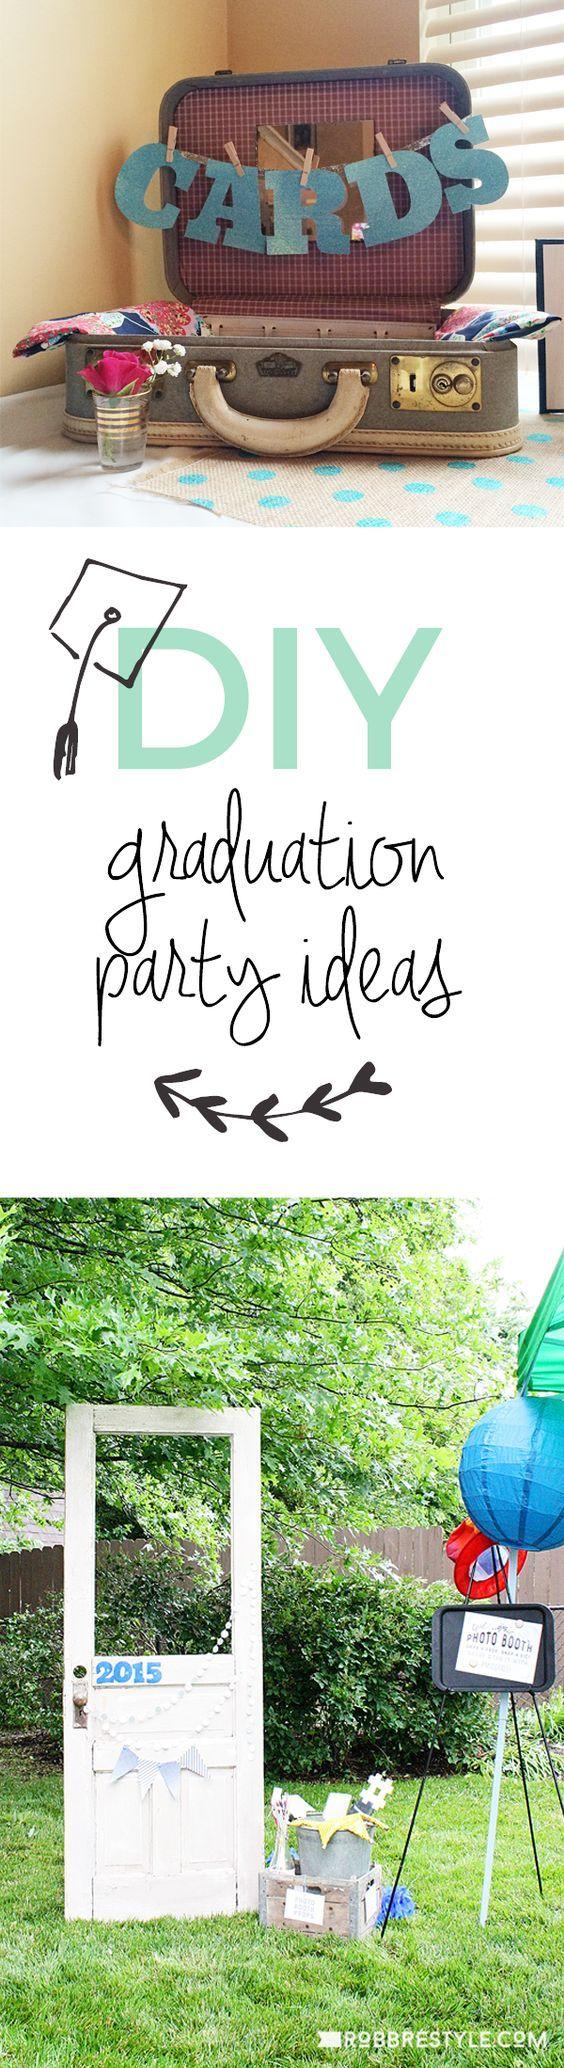 DIY Graduation Party Ideas 134 best Ideas